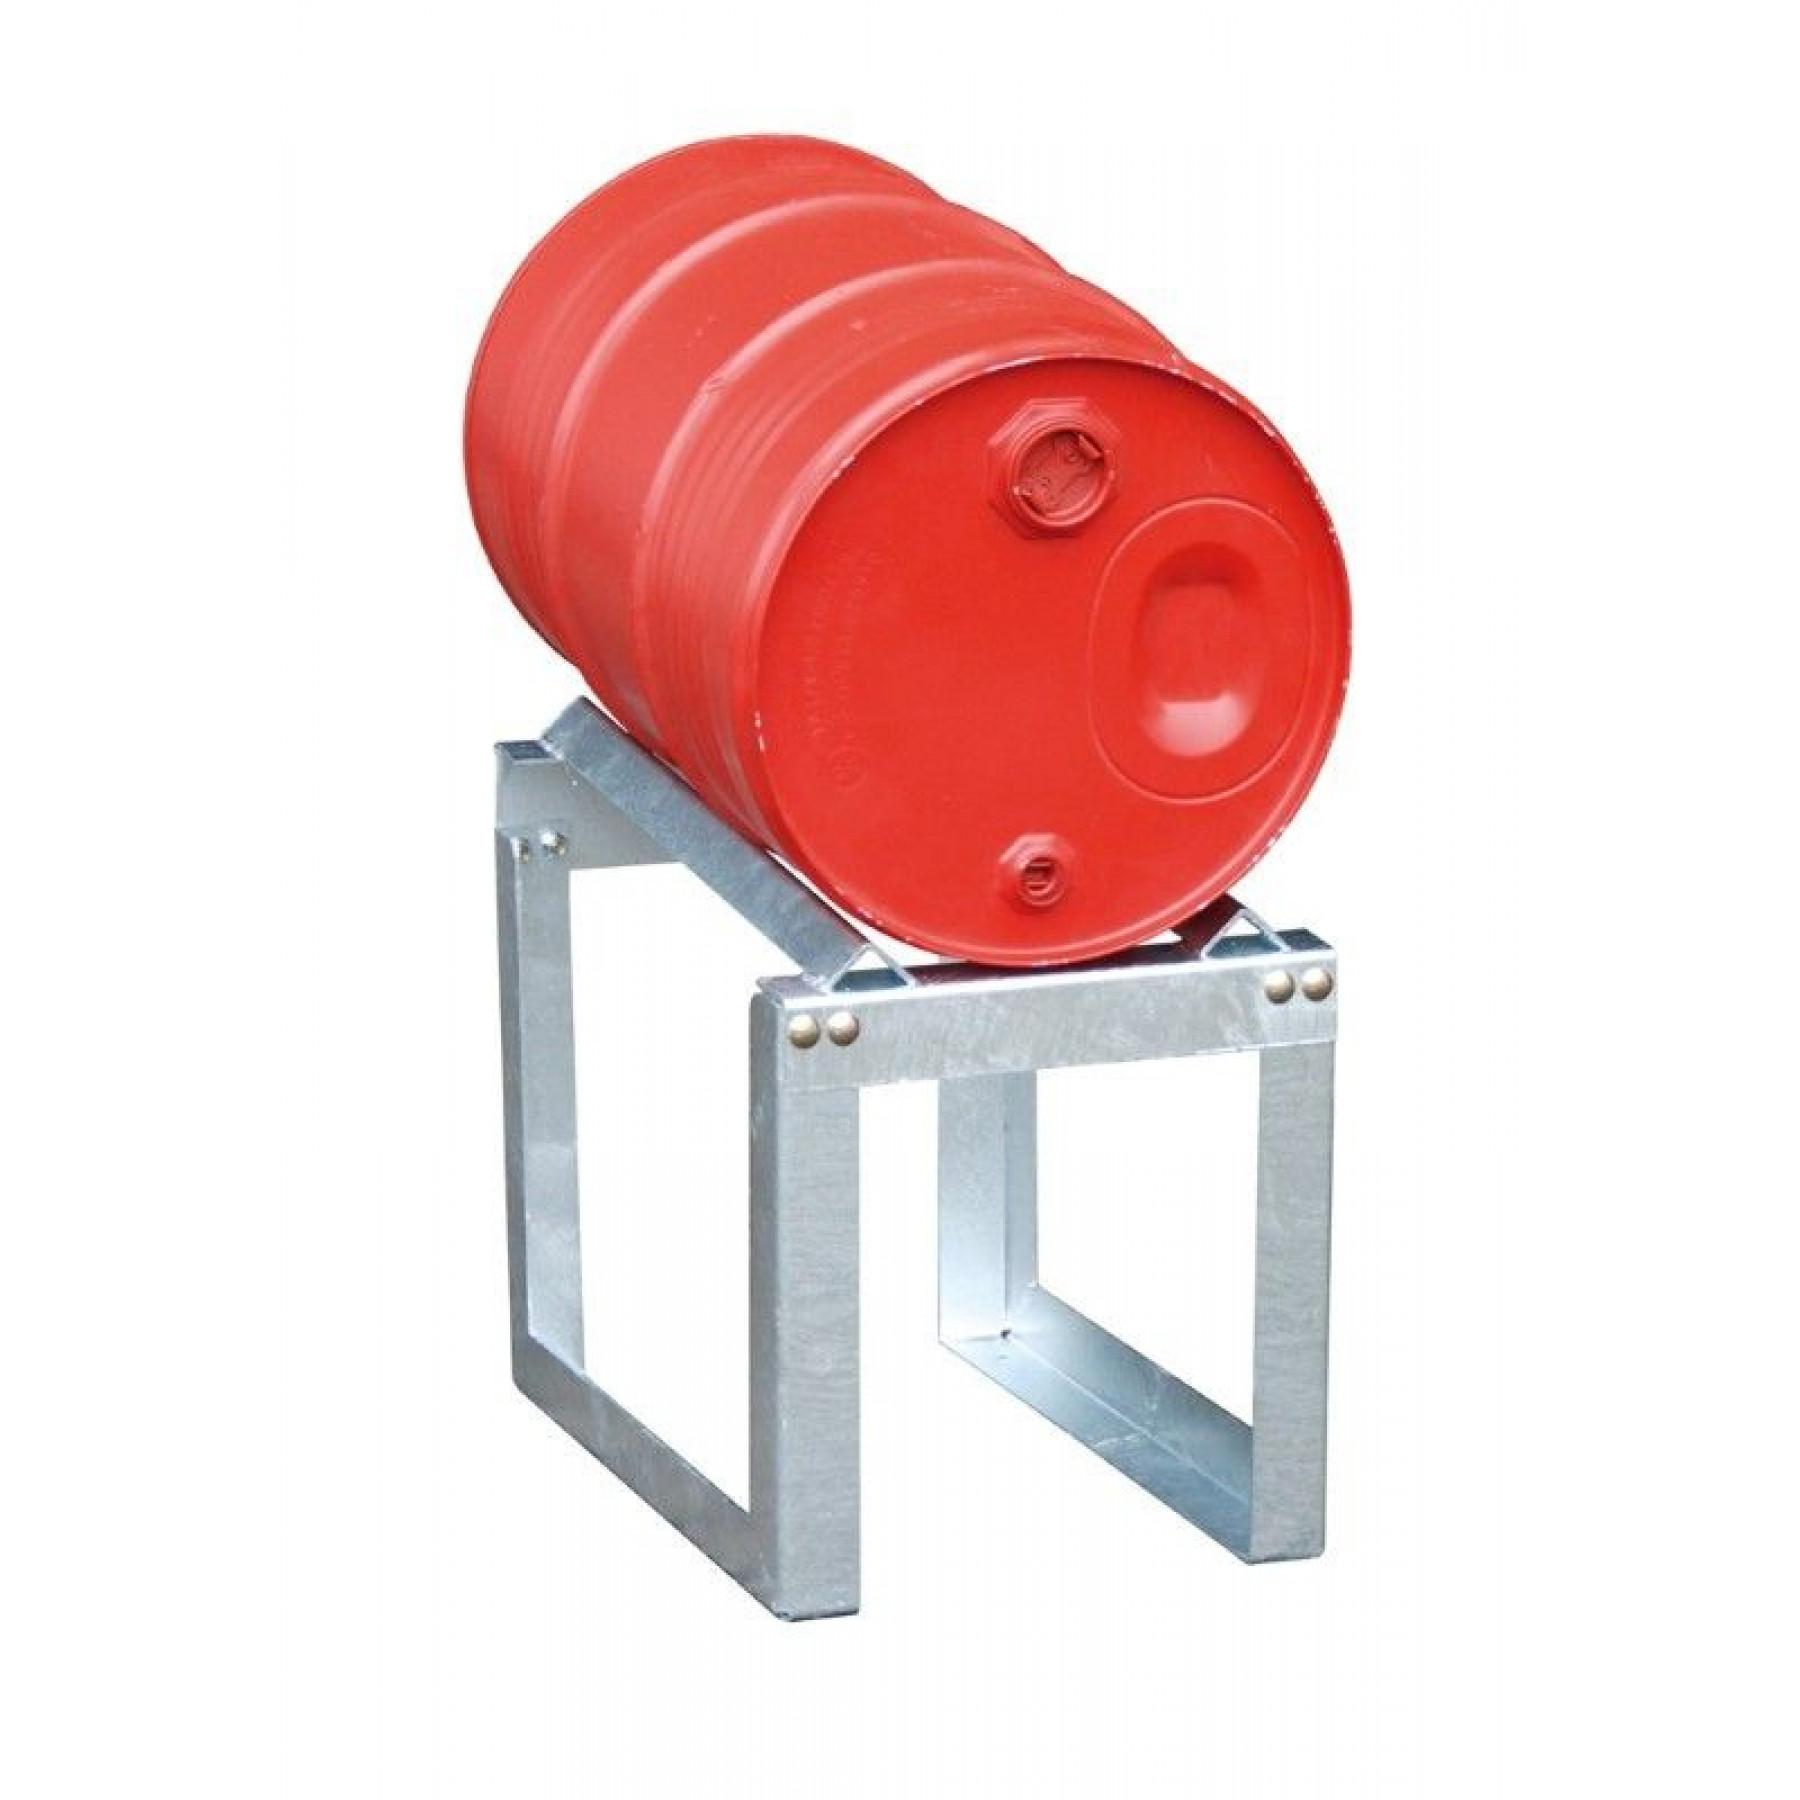 Vatenrek t.b.v. 1 x 60 liter vat, verzinkt, 70049-FA60-1